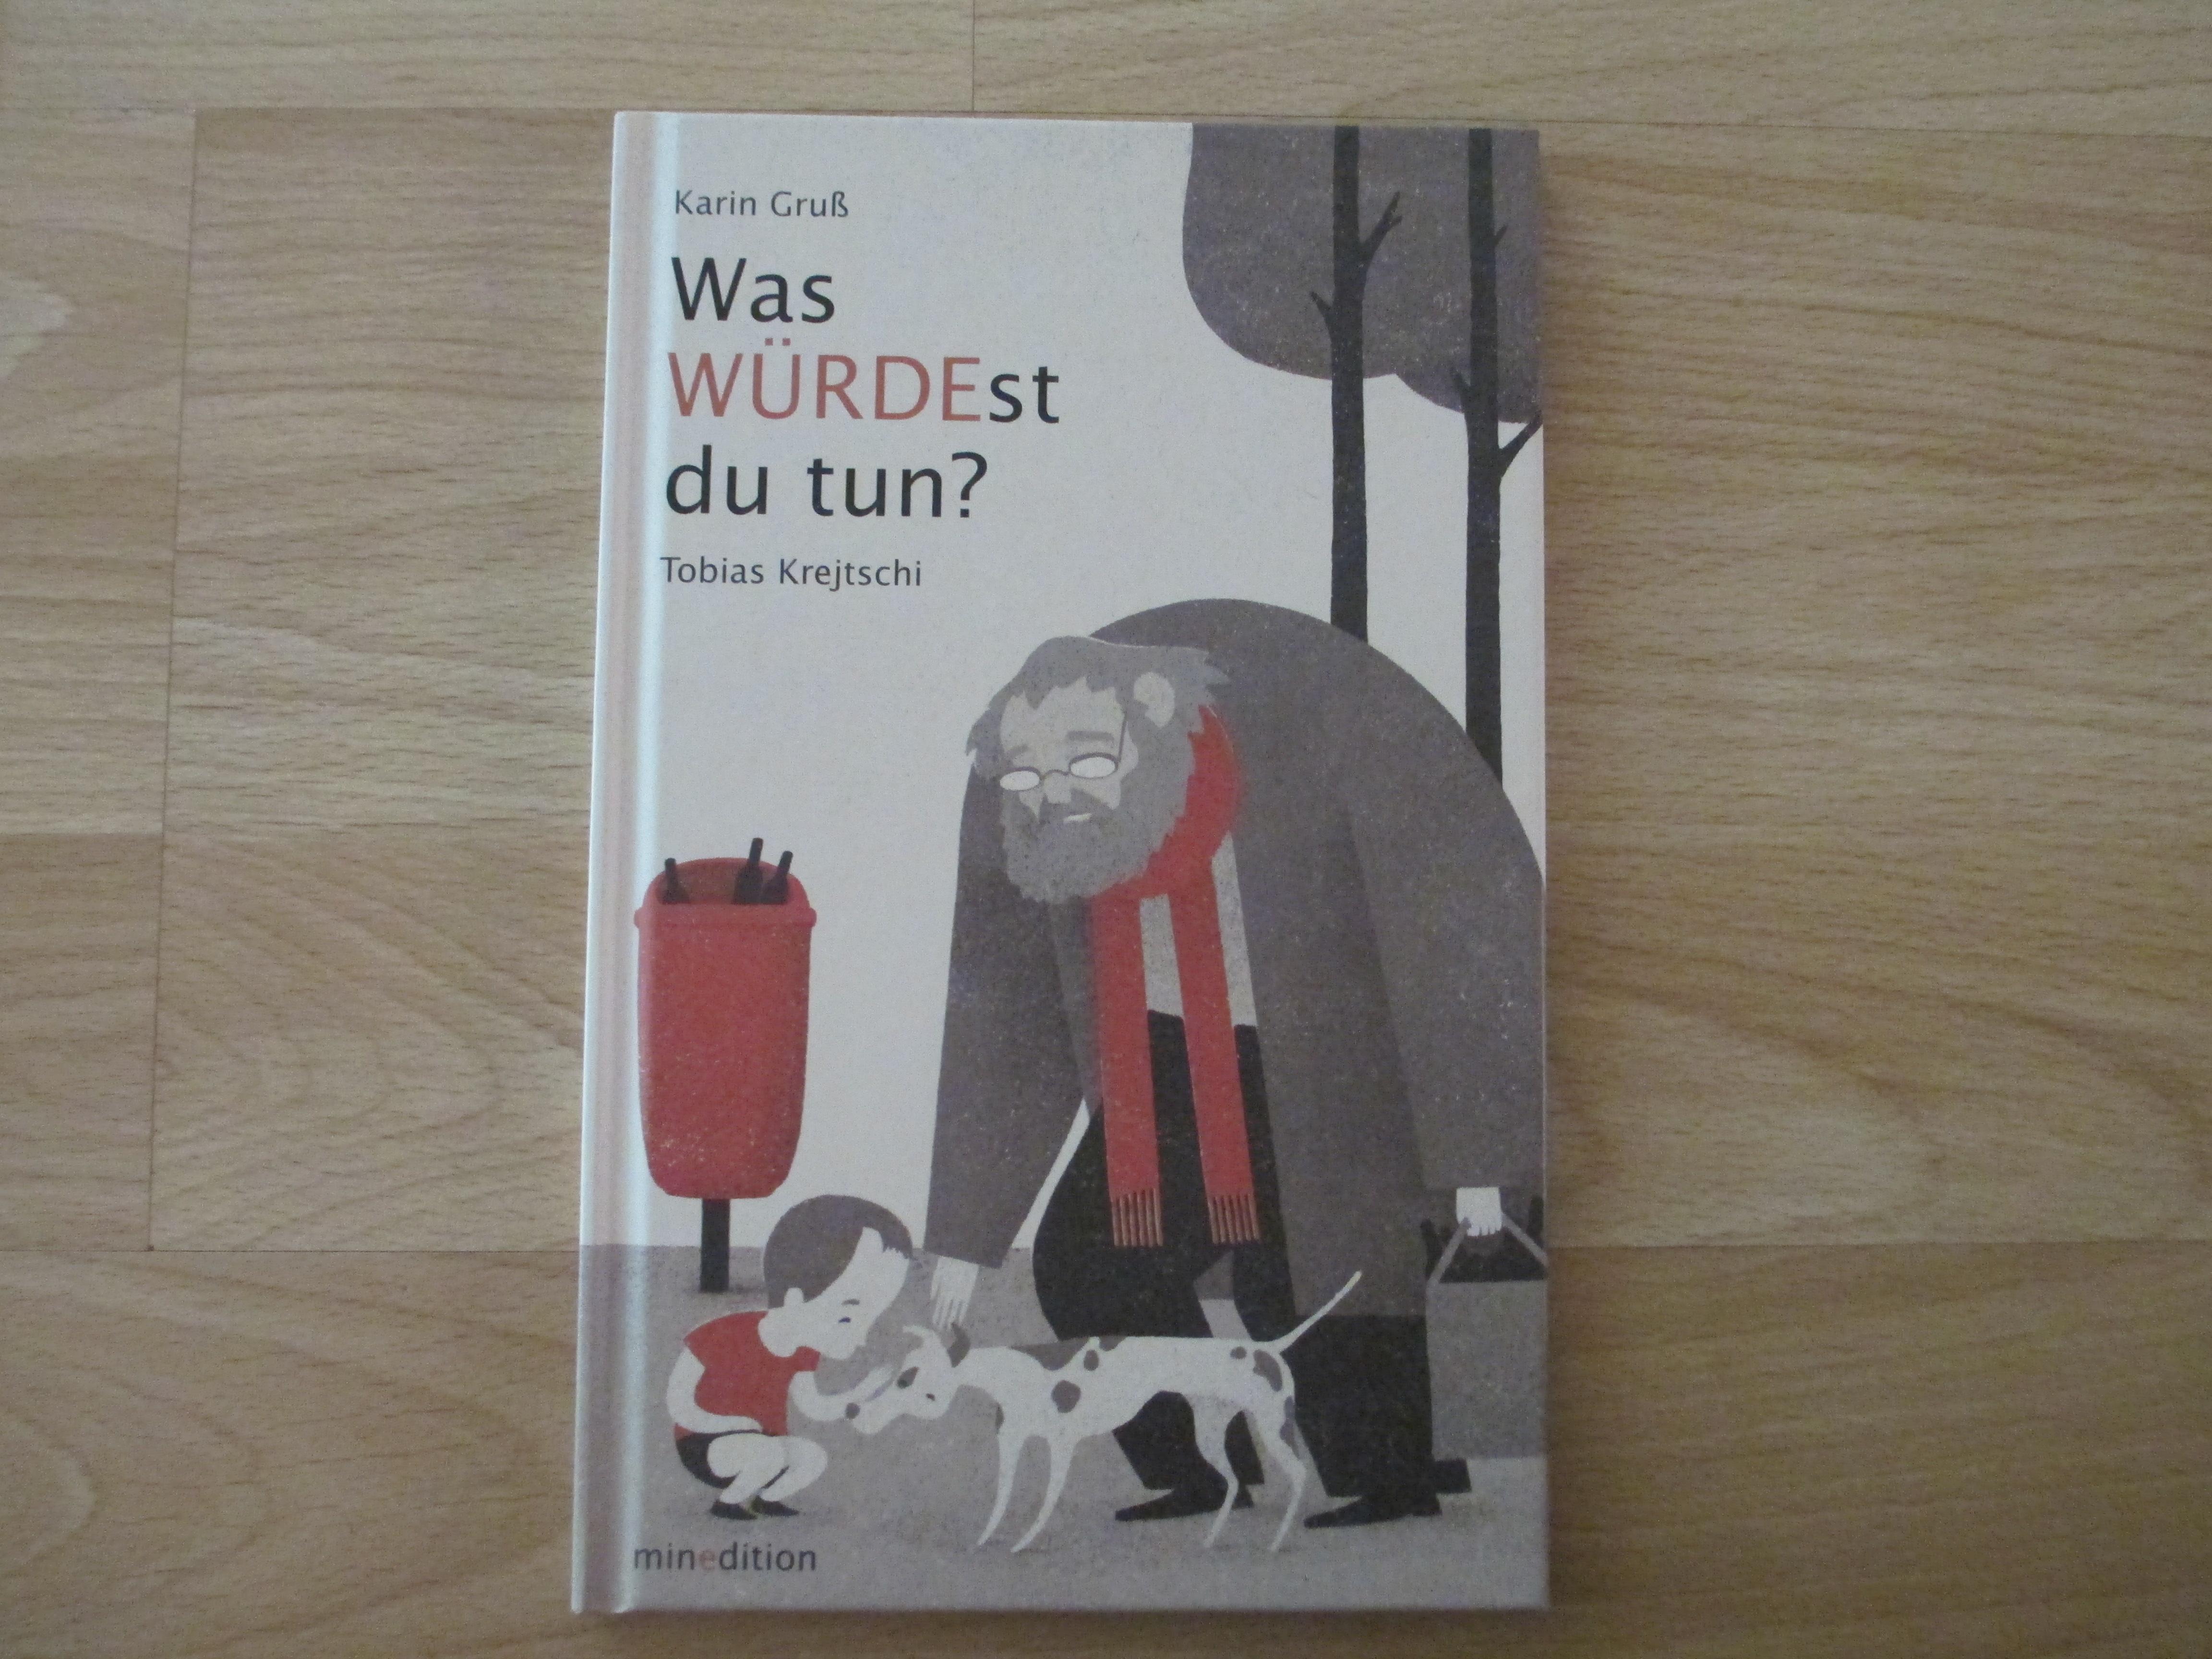 Was WÜRDEst du tun? Book Cover